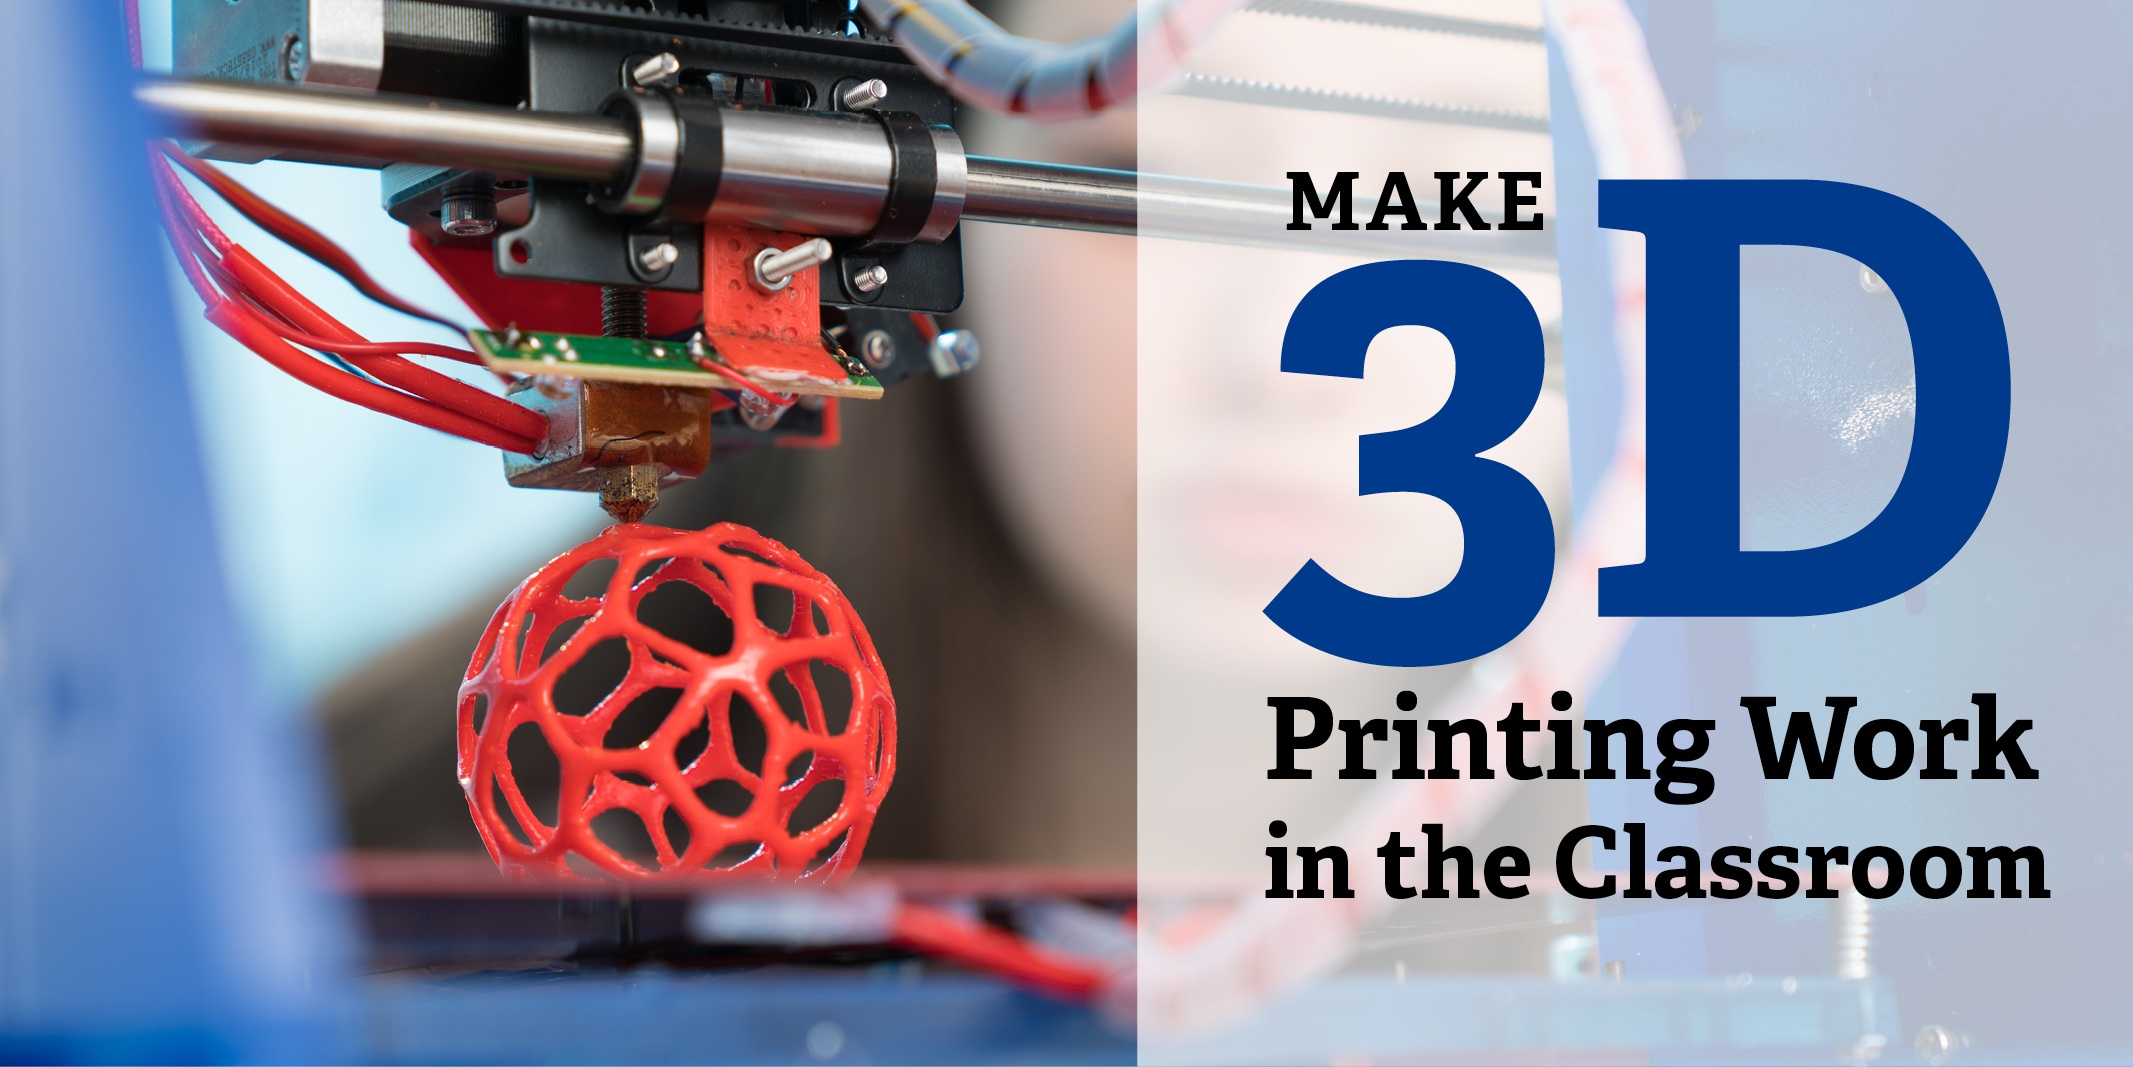 Make 3D Printing Work